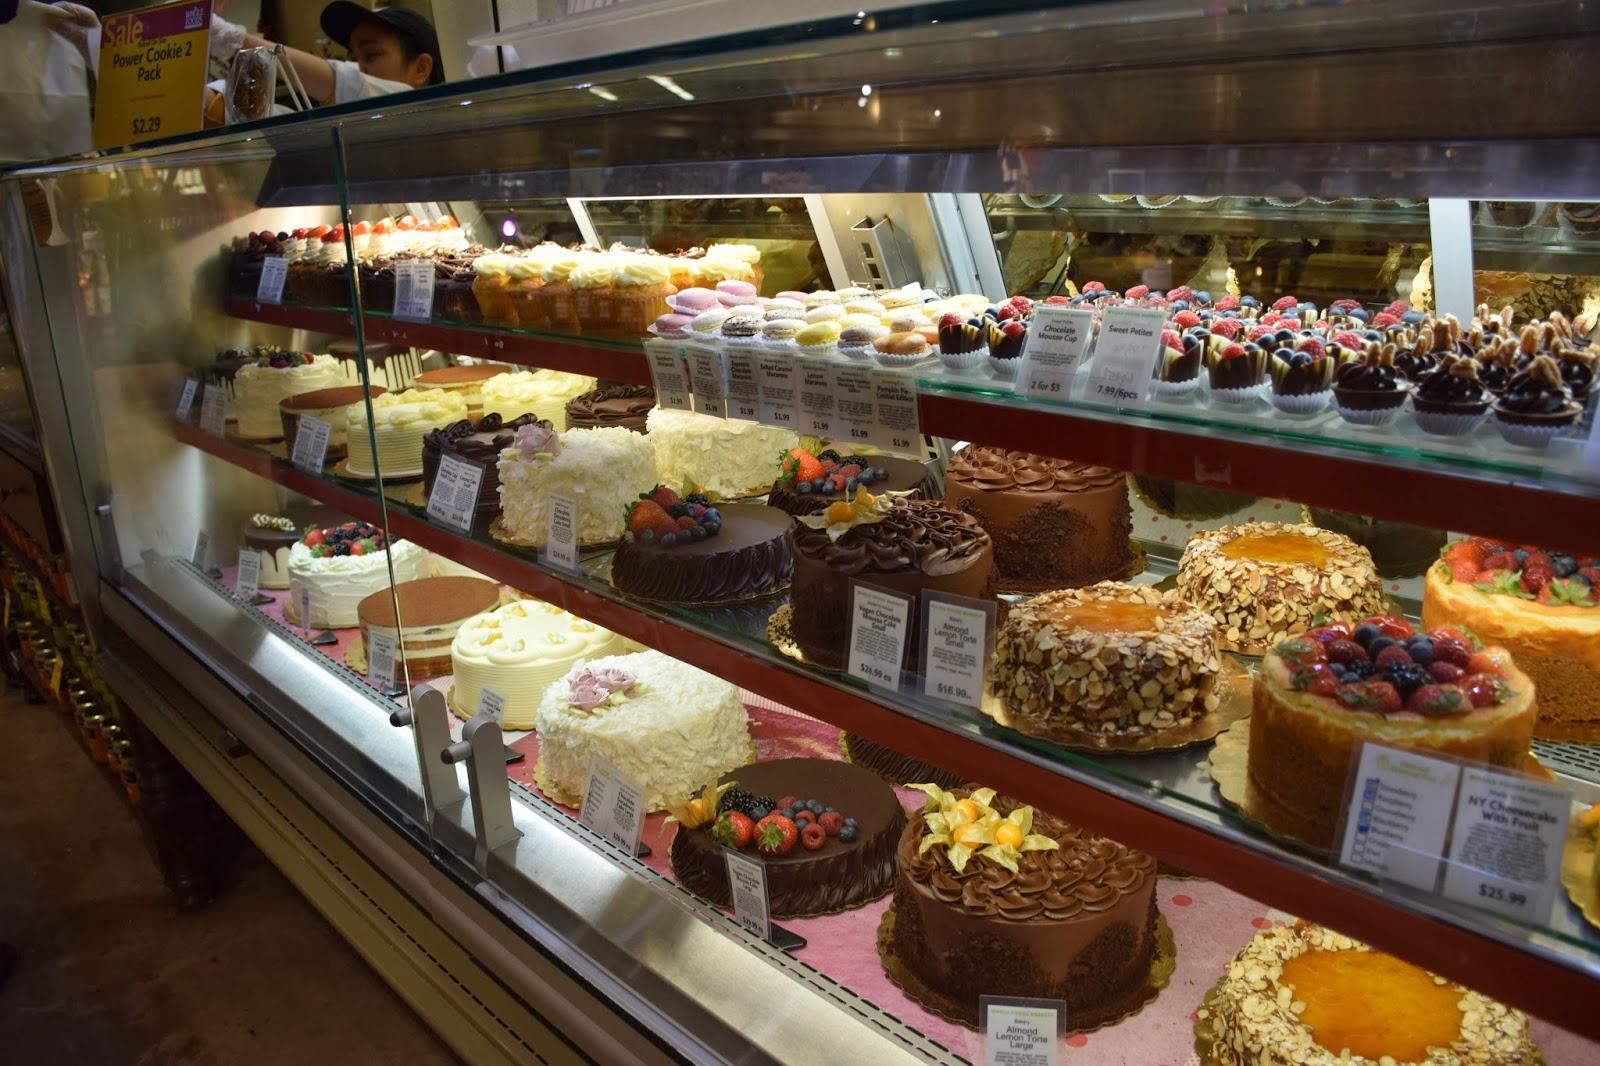 Vancity Noms Whole Foods Amazing Cakes